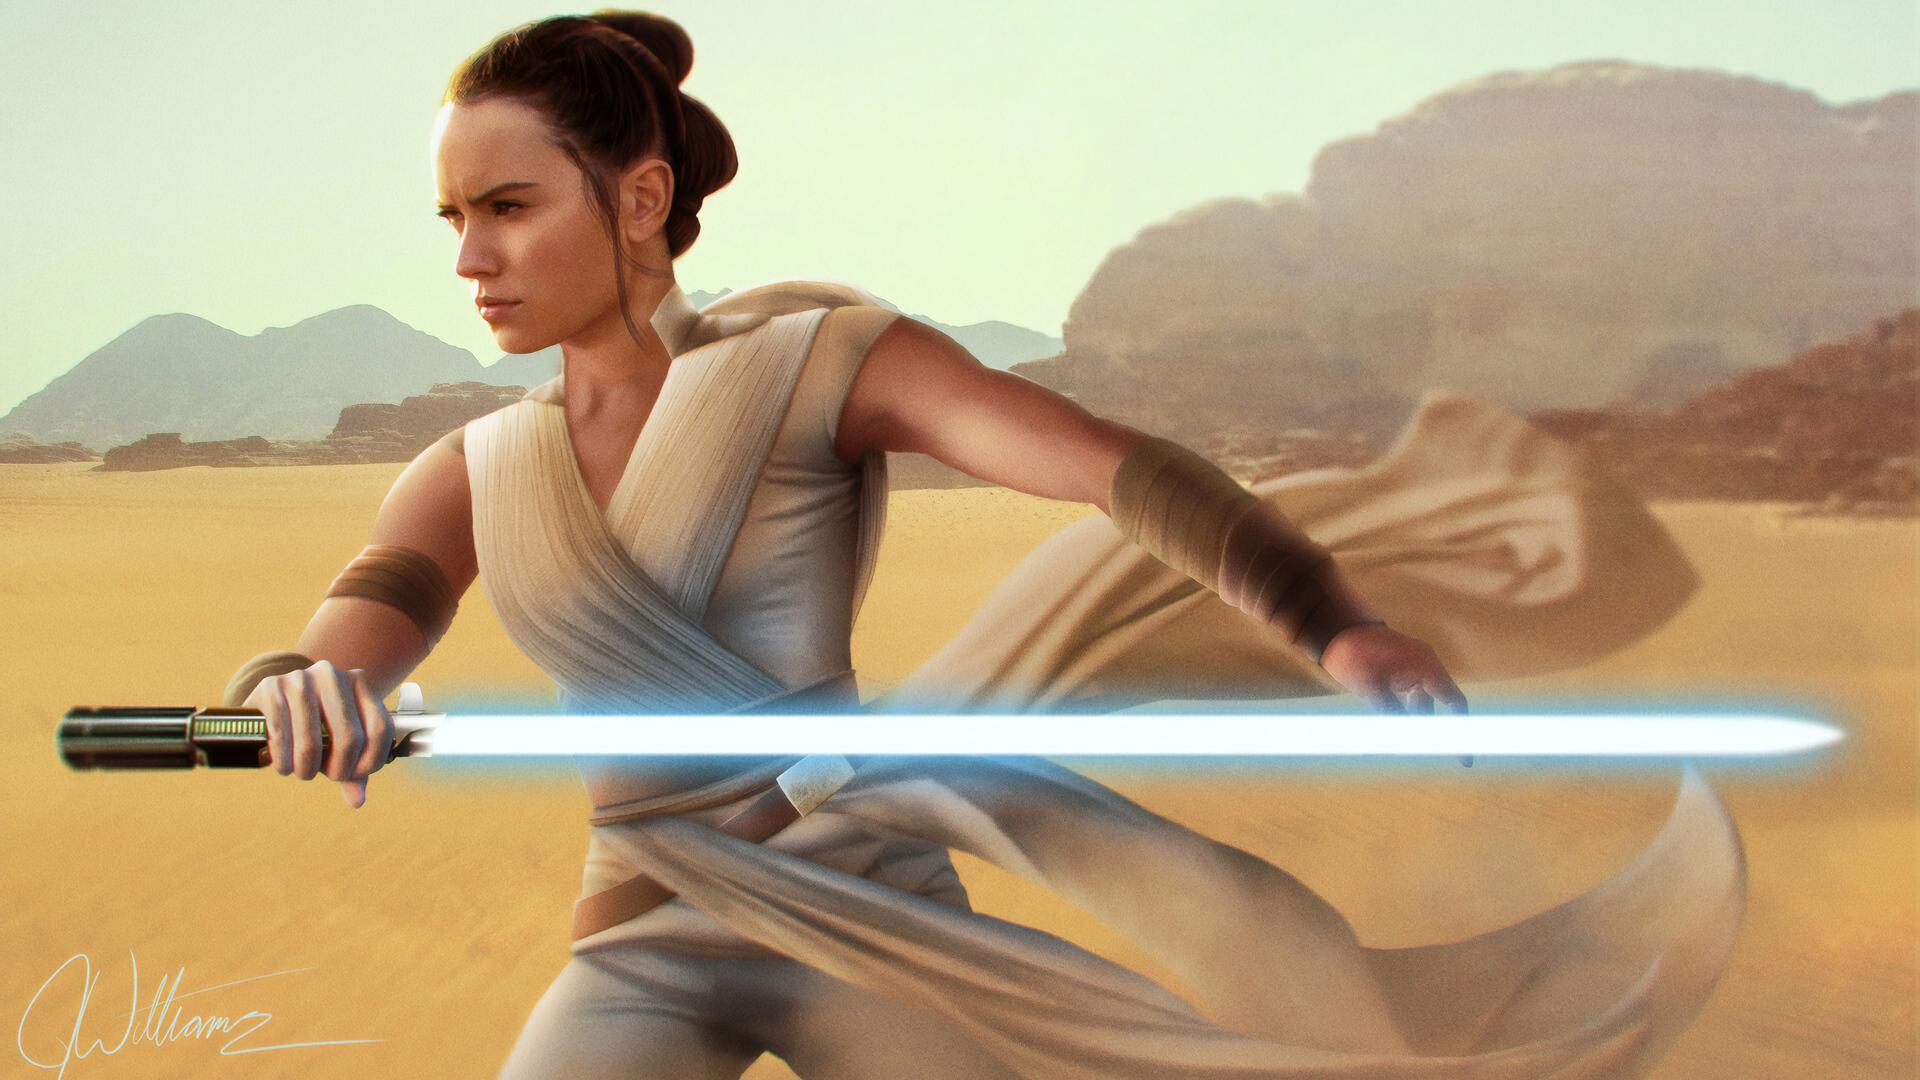 rey-star-wars-with-sword-digital-art-4k-gx.jpg